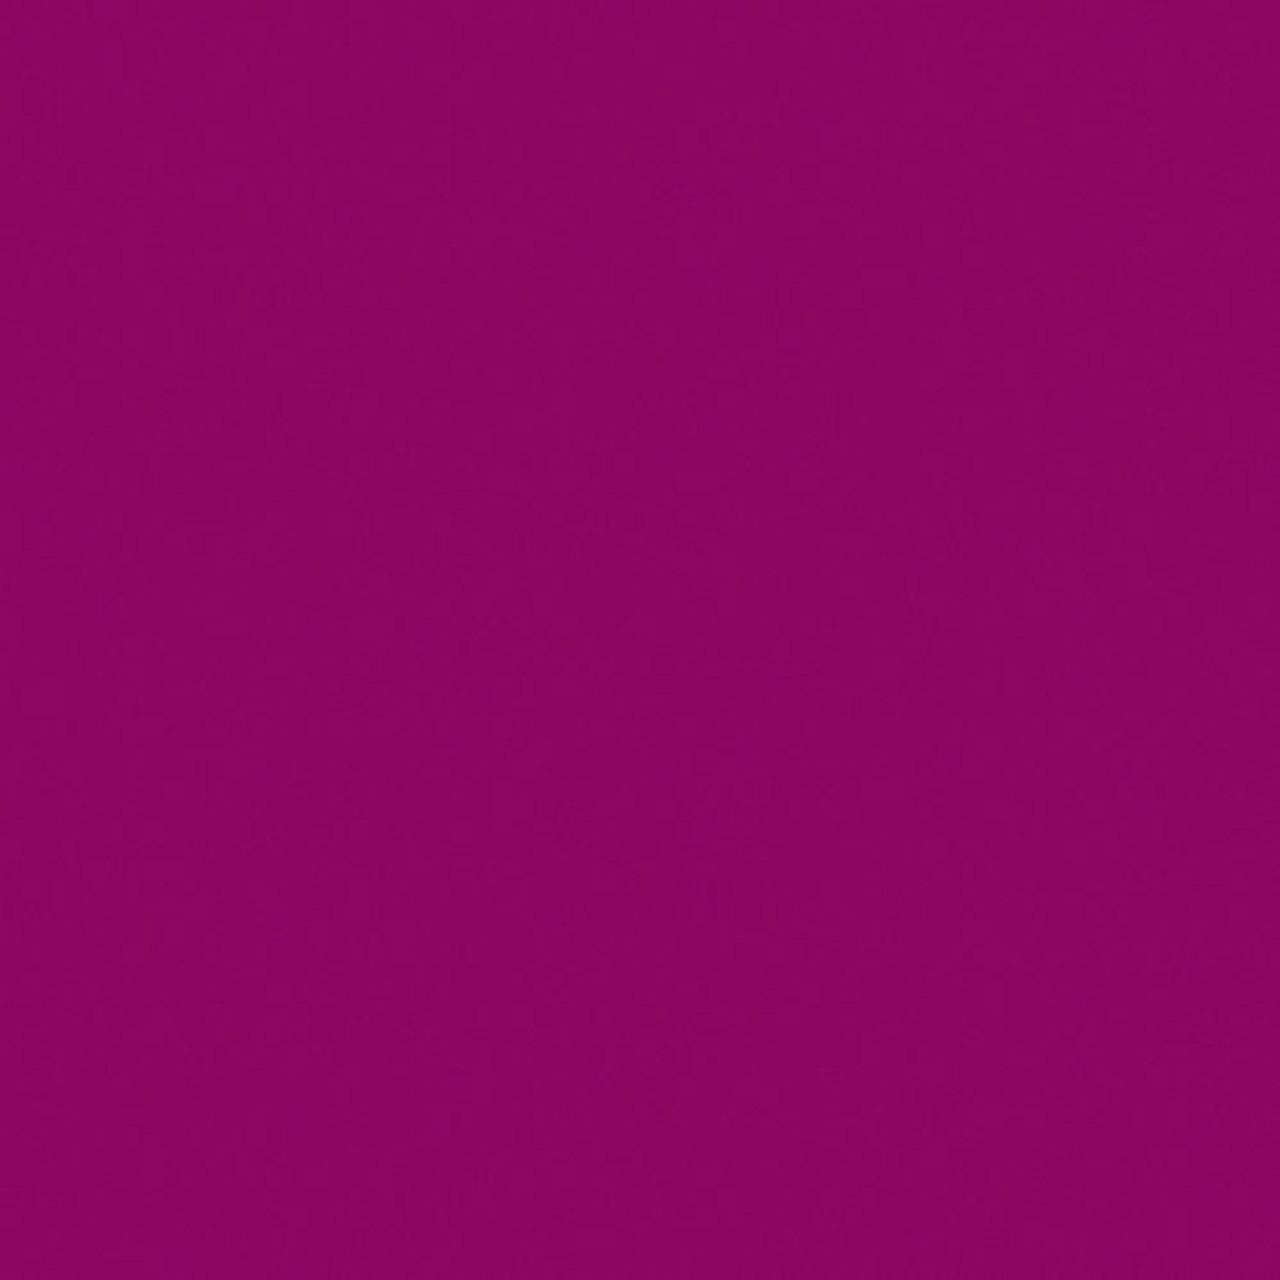 "#0039 Rosco Gels Roscolux Skelton Exotic Sangria, 20x24"""